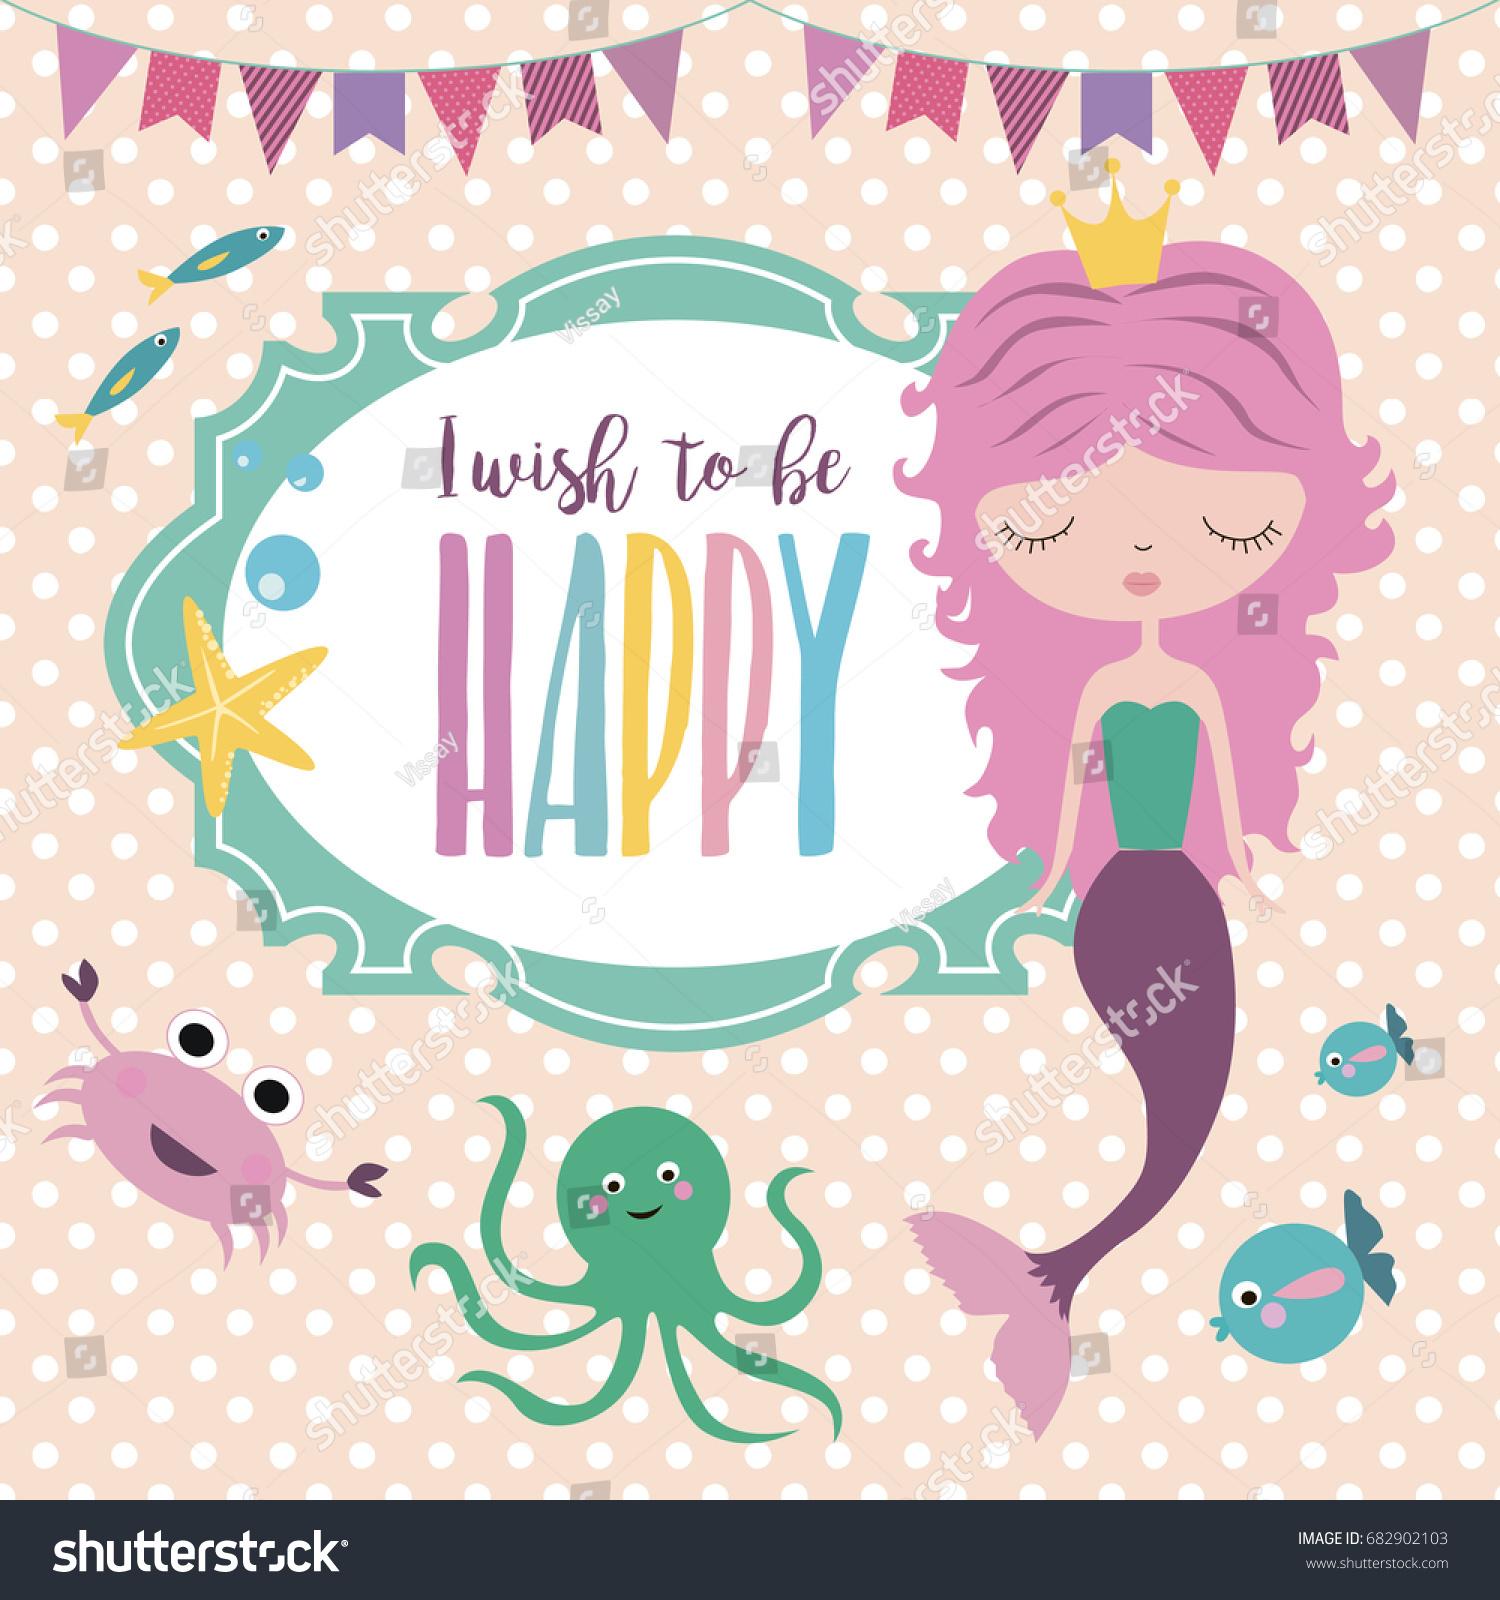 Happy Birthday Invitation Party Greeting Card Stock Vector HD ...